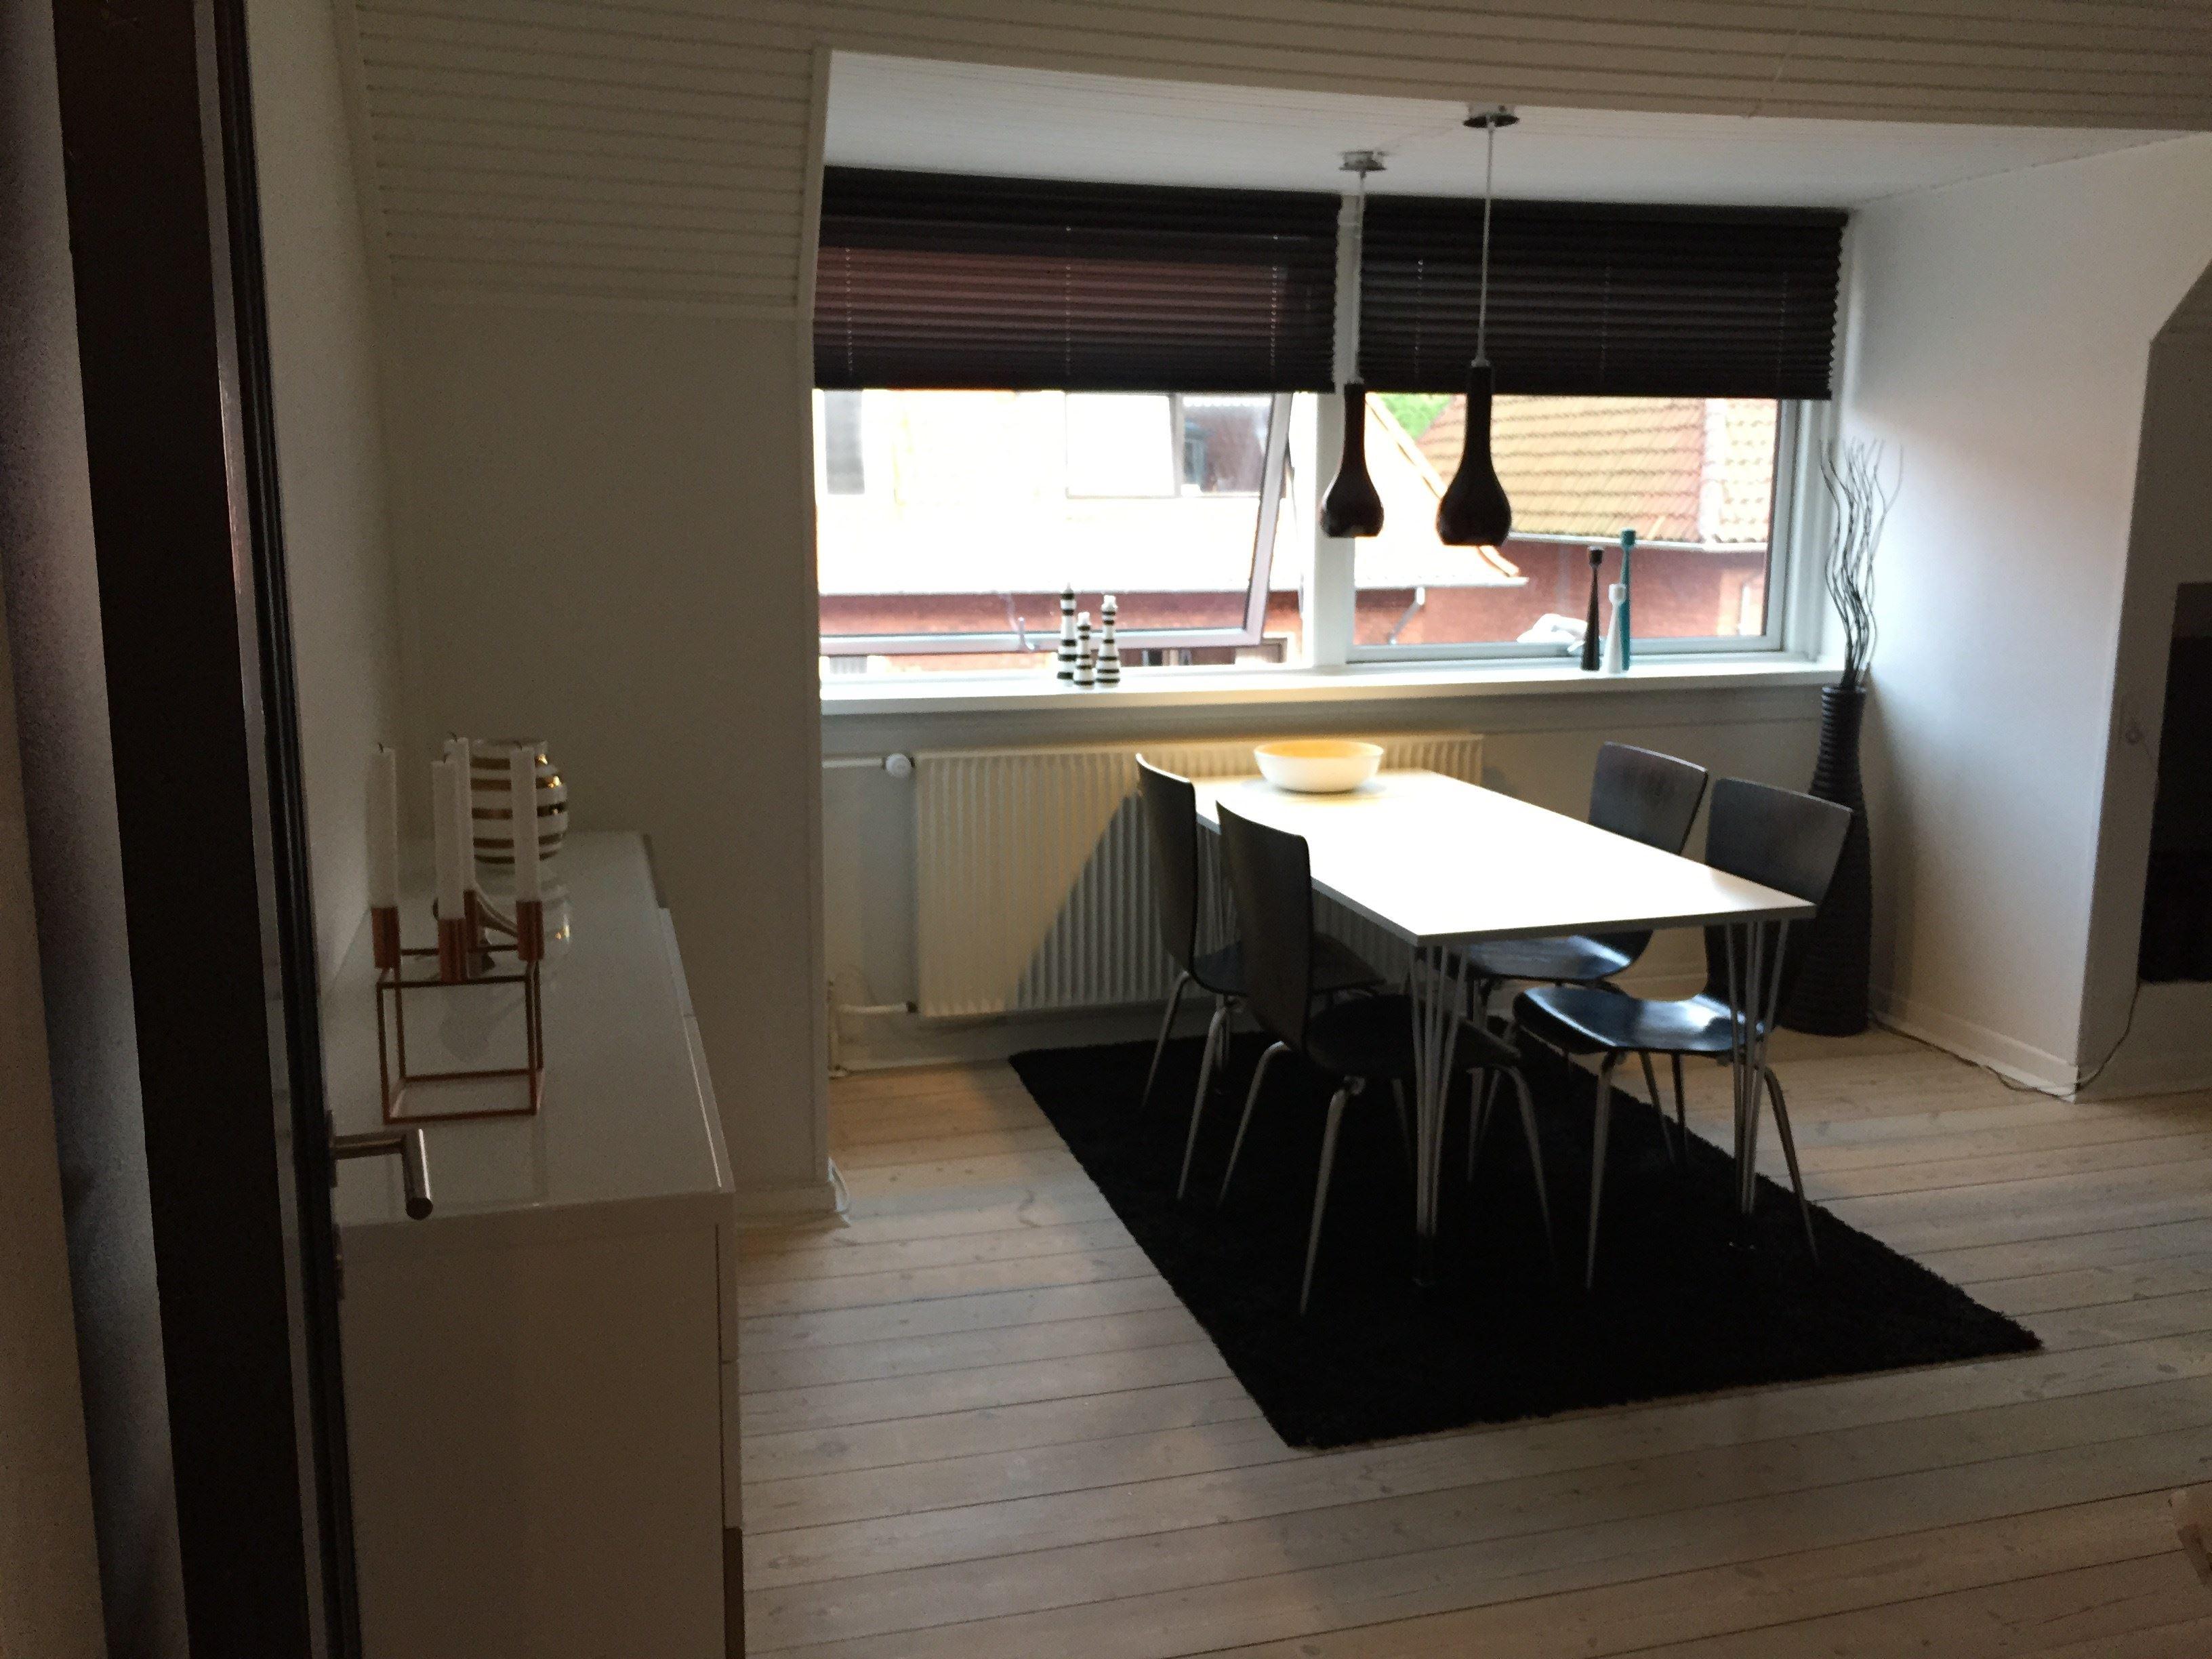 Nansensgade 19 2 TV, 5000 Odense C